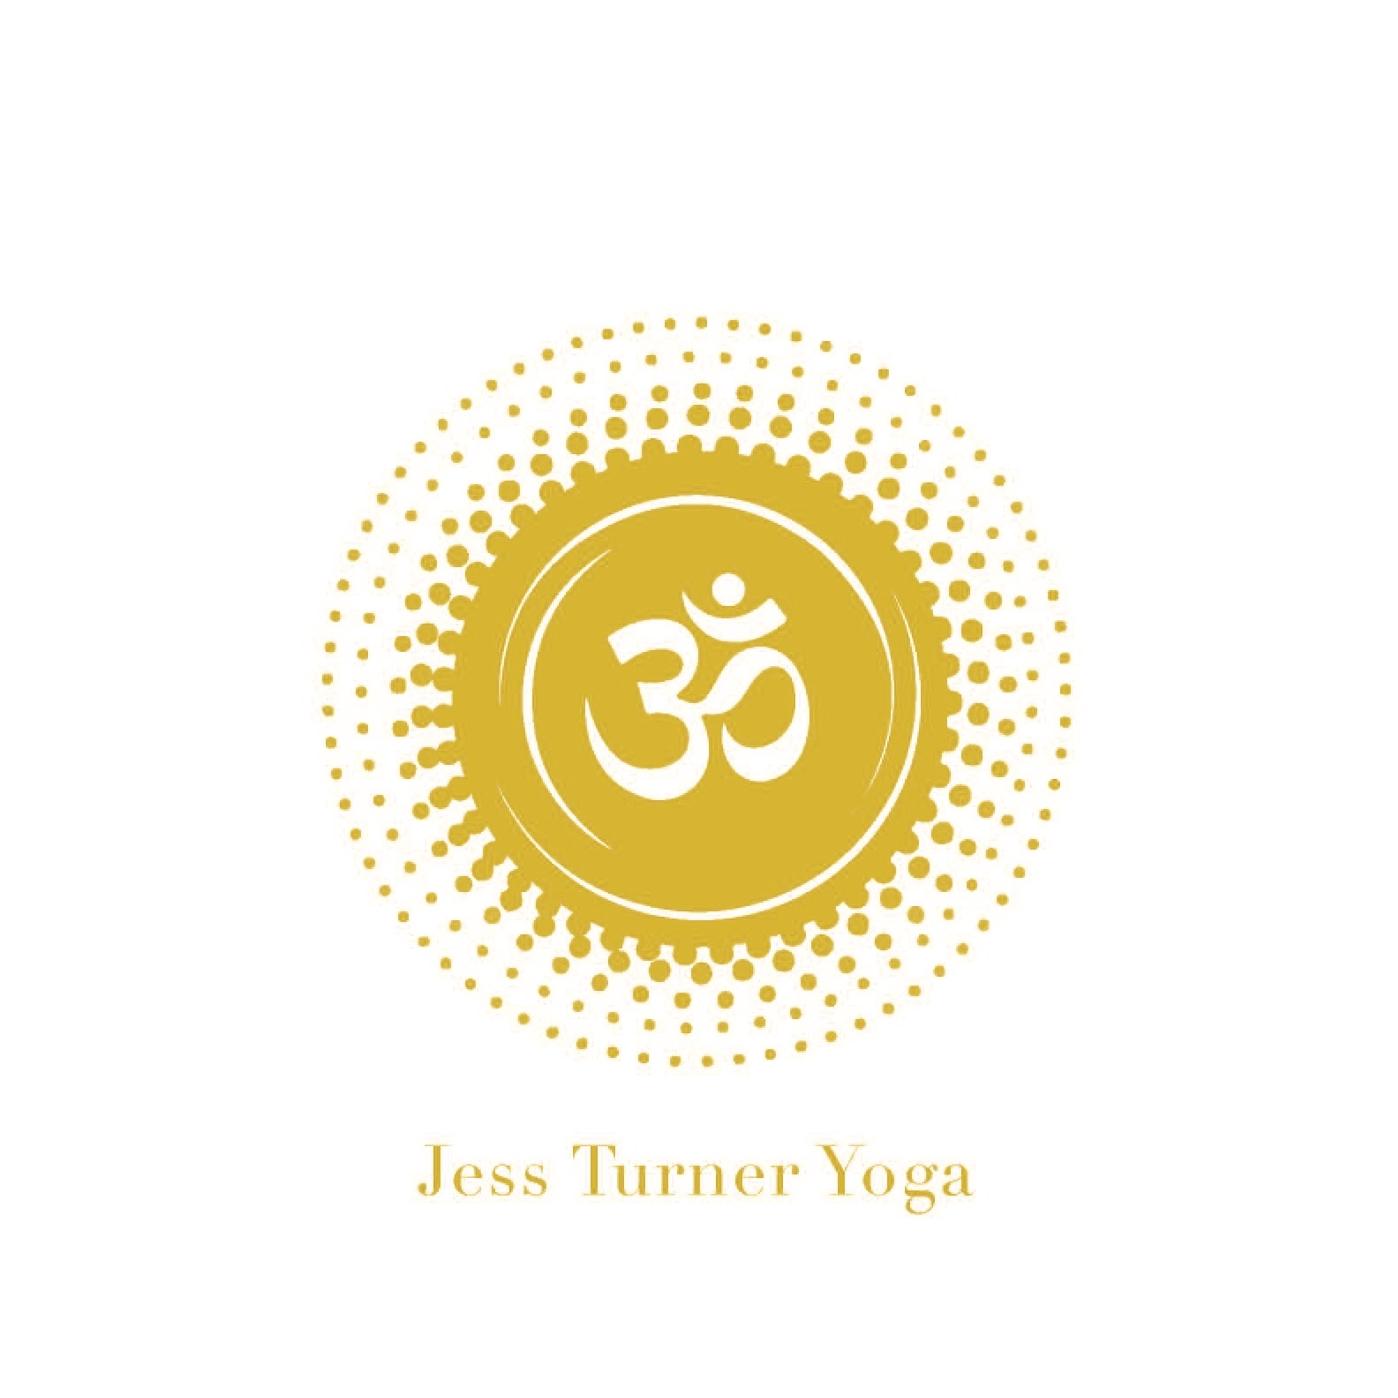 Jess Turner Yoga Logo